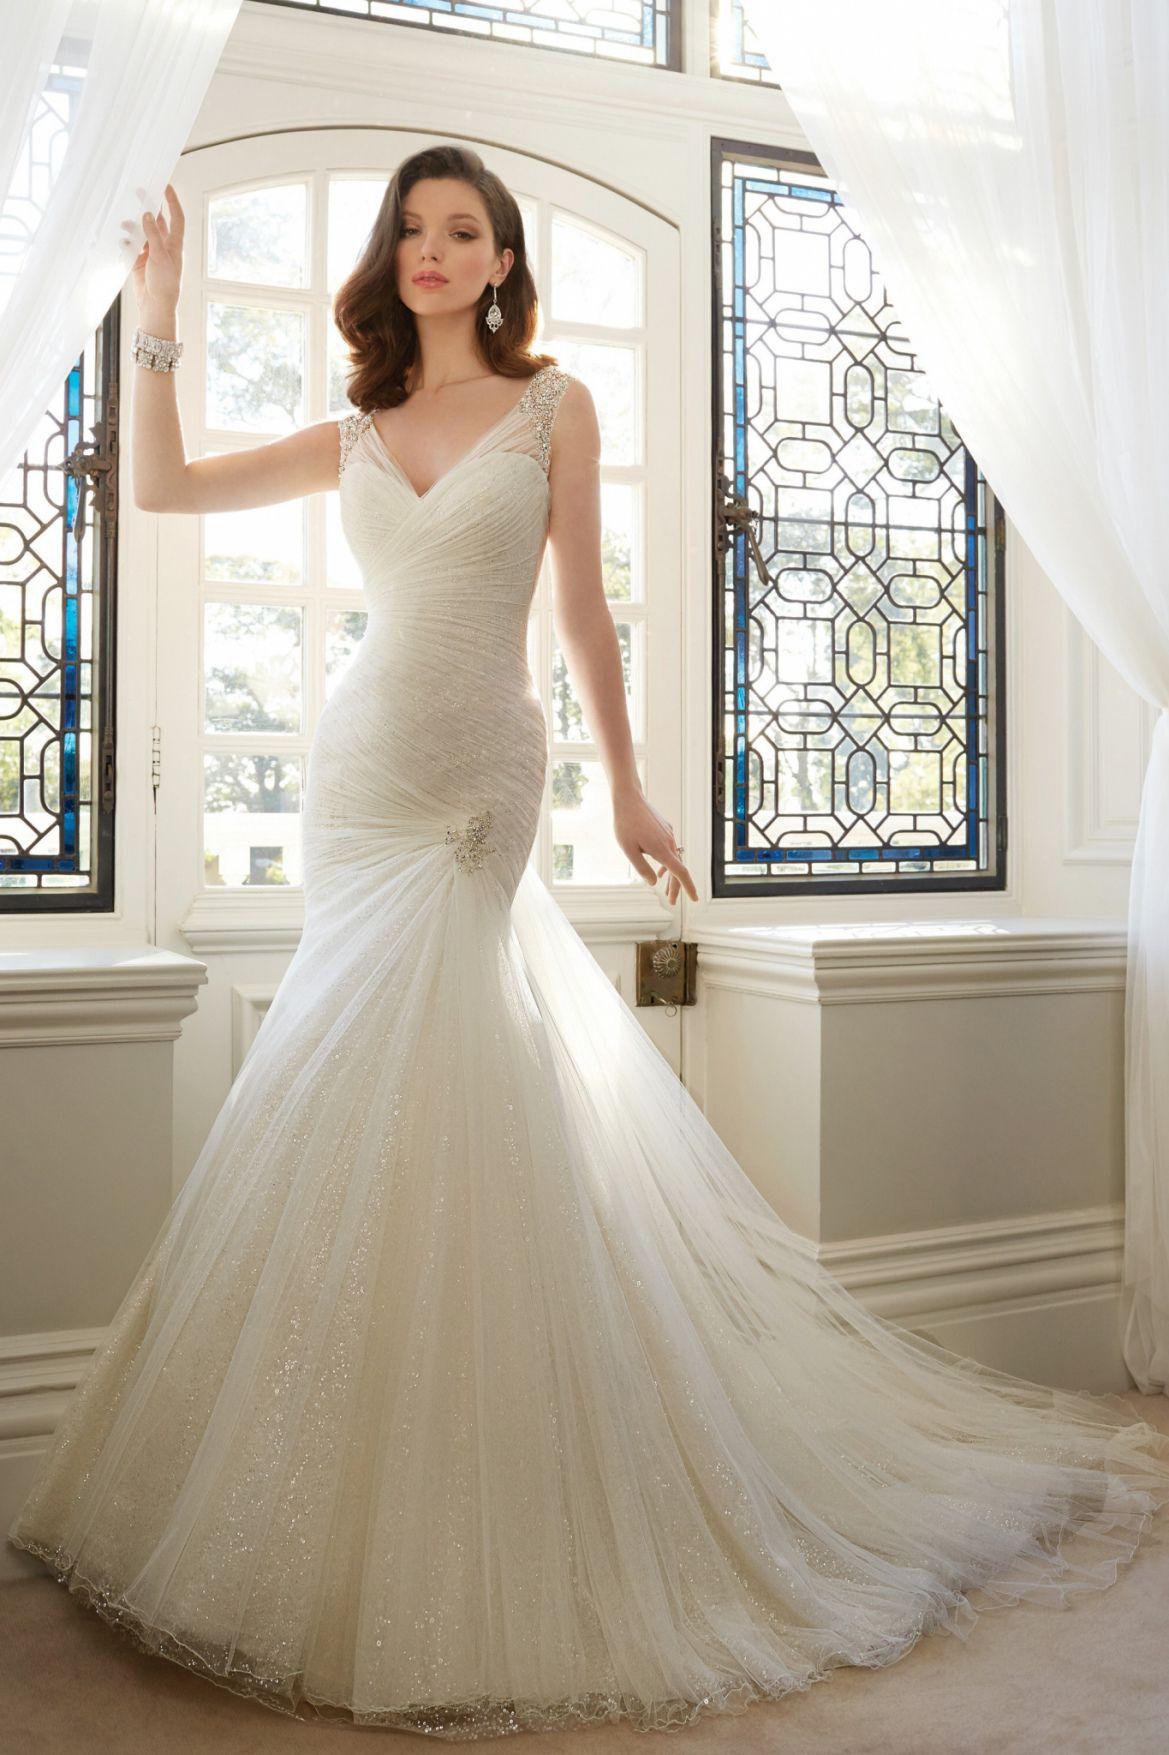 77+ Wedding Dresses Spokane Wa - How to Dress for A Wedding Check ...